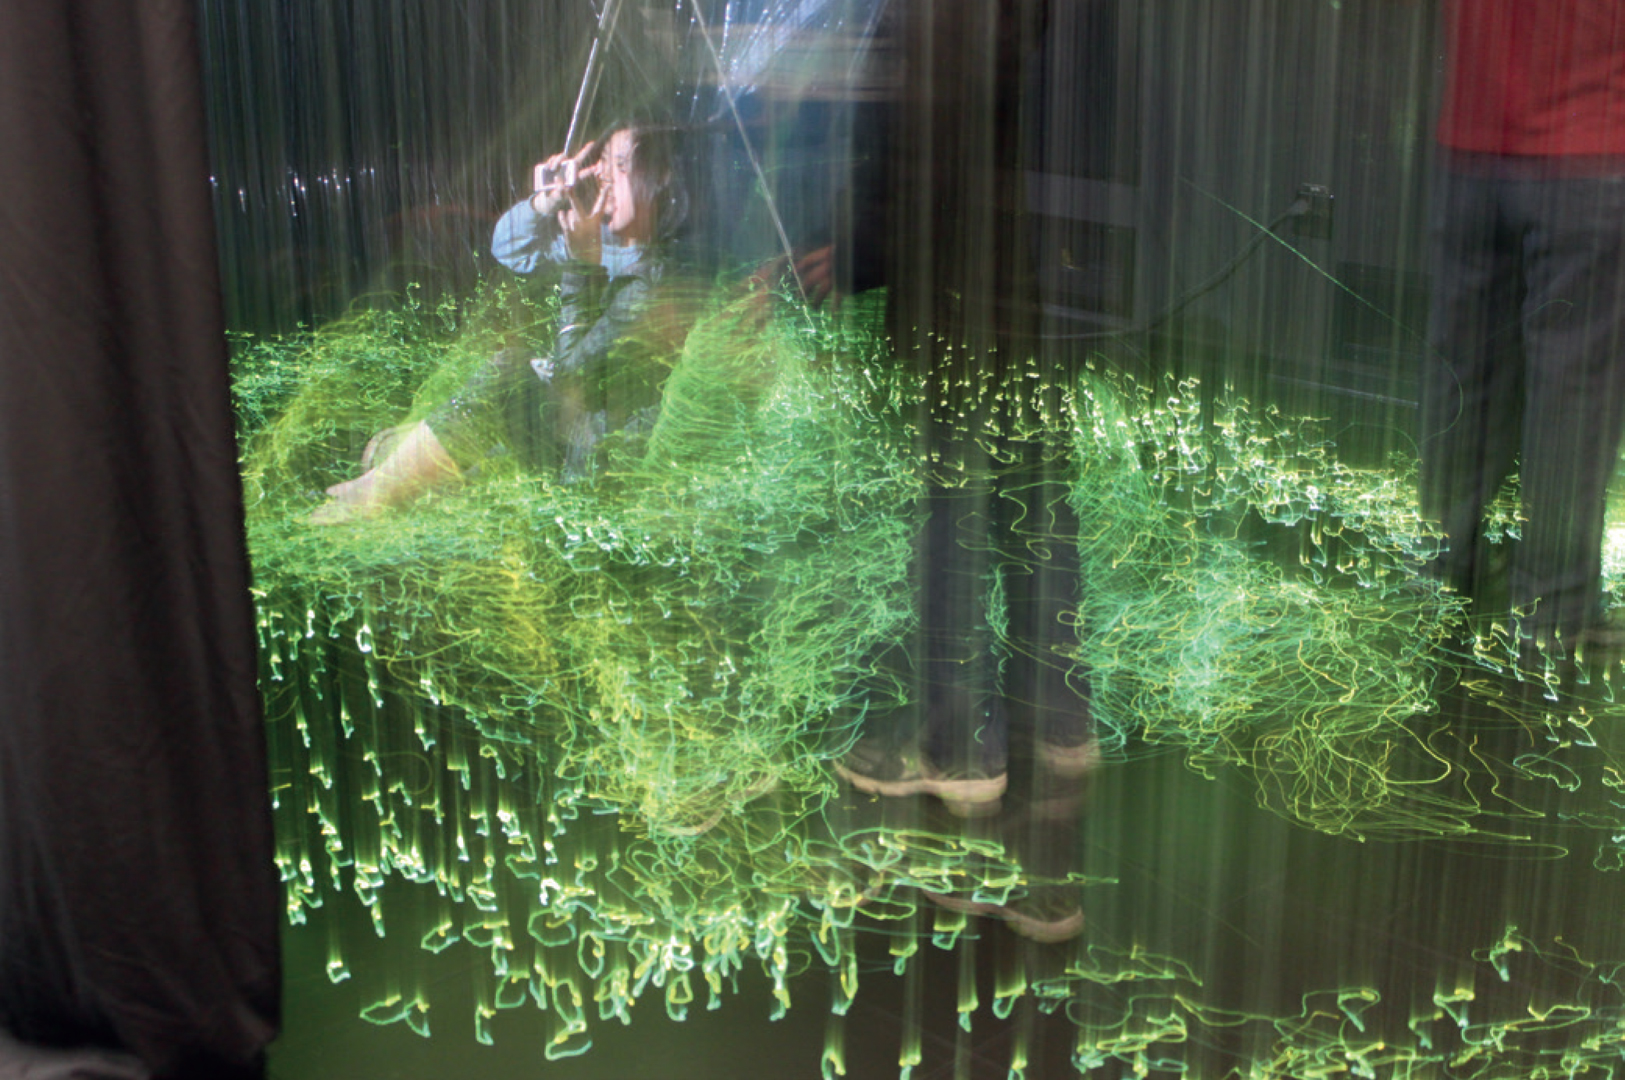 ©, Jinsil Hwaryoung Seo and Greg Corness, Light Strings: Kinesthetic immersive environment